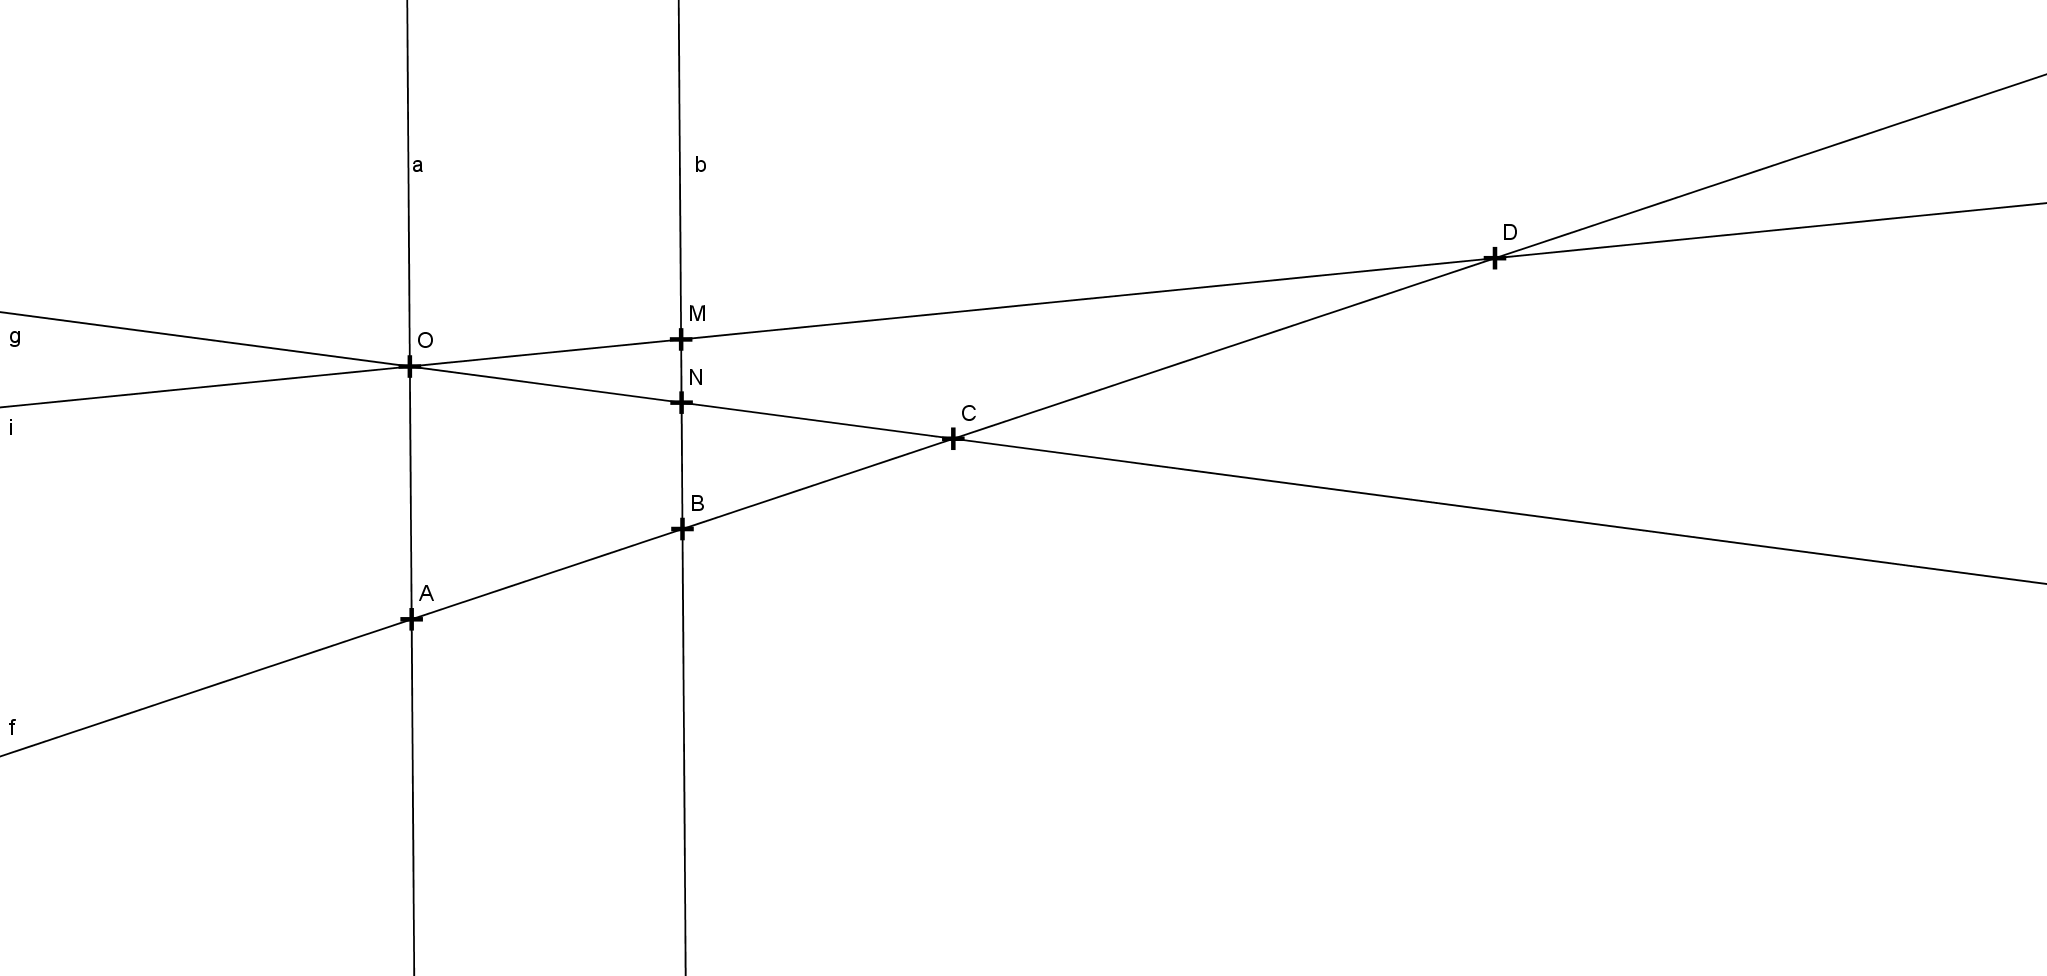 http://forum.matematika.cz/upload3/img/2017-05/22335_PODOBNOST.png